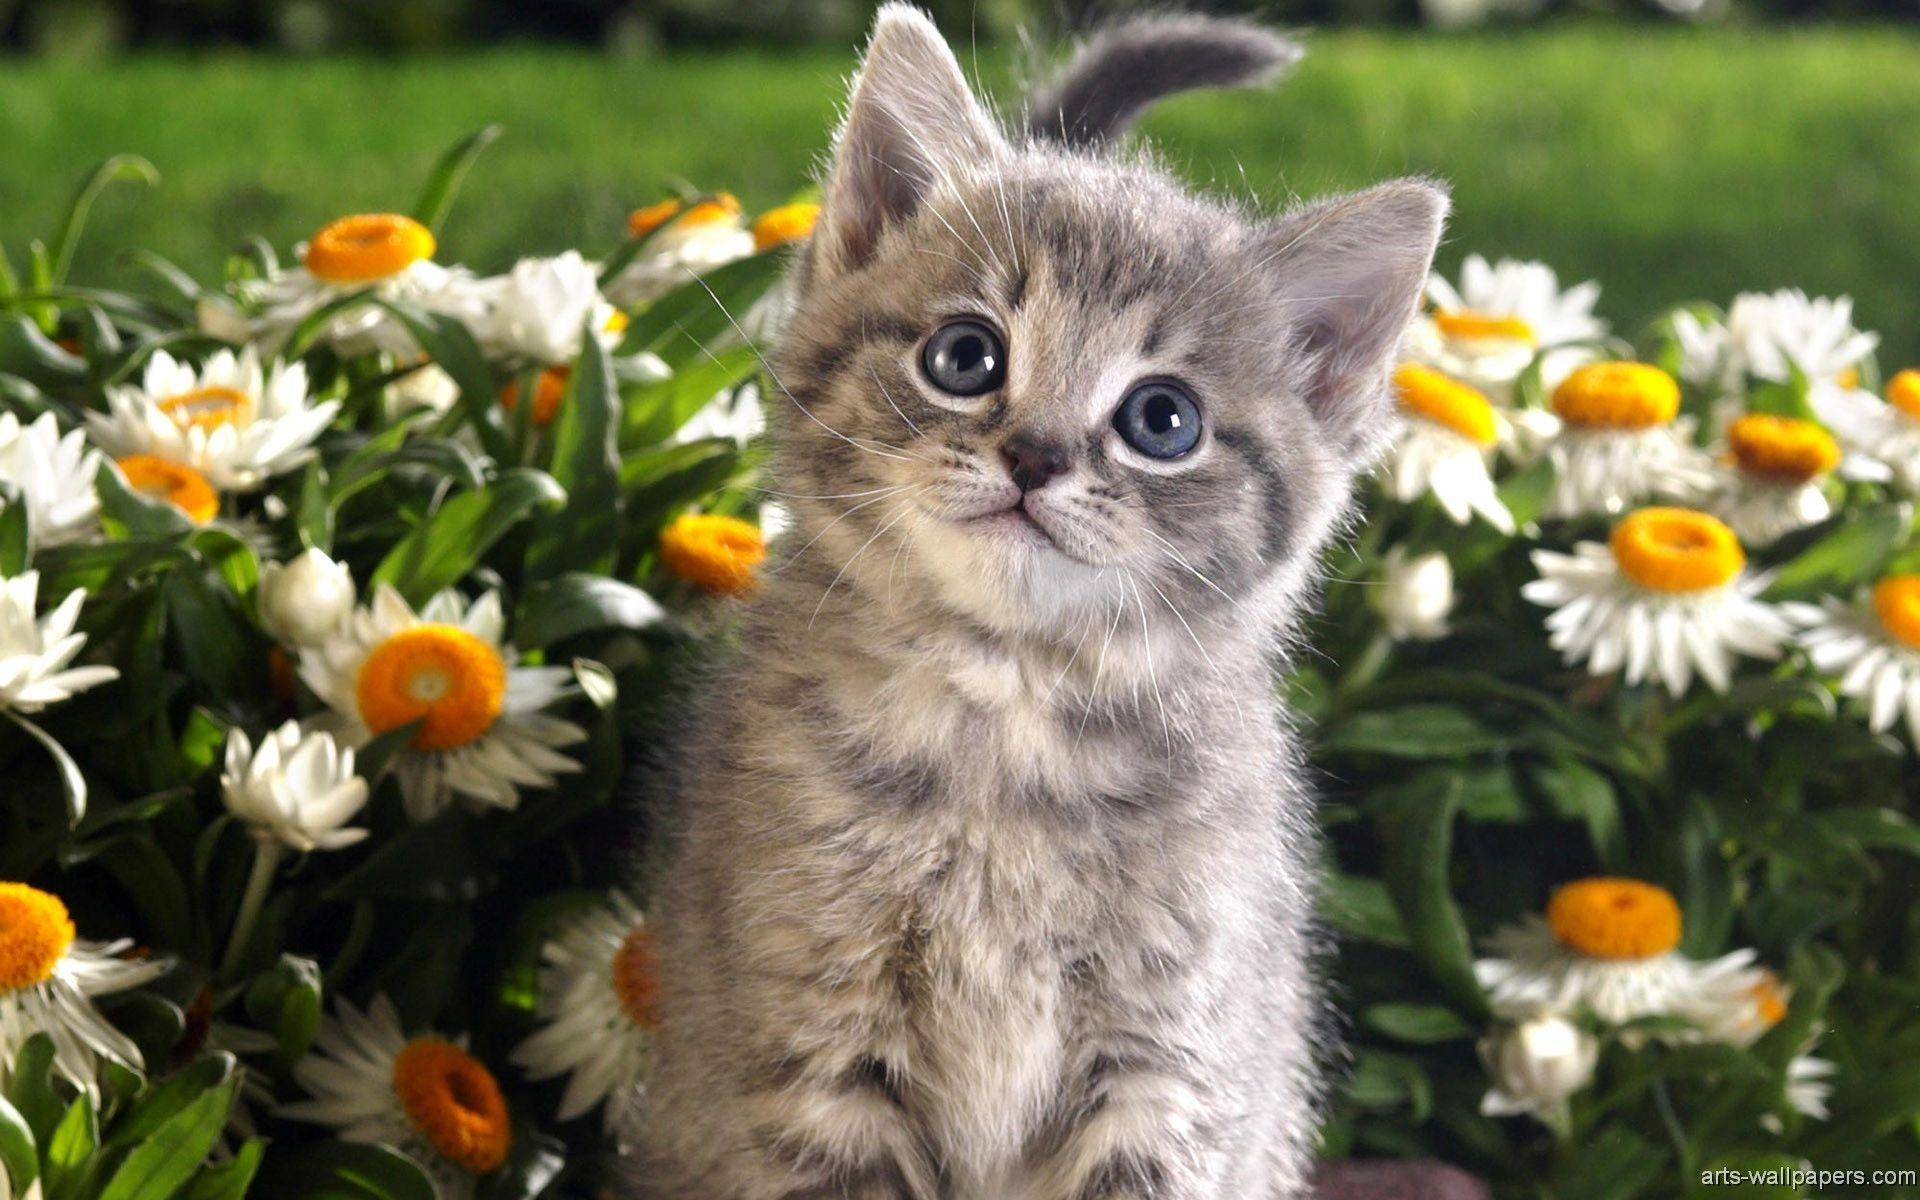 Kittens wallpaper download free stunning full hd - Free wallpaper of kittens ...